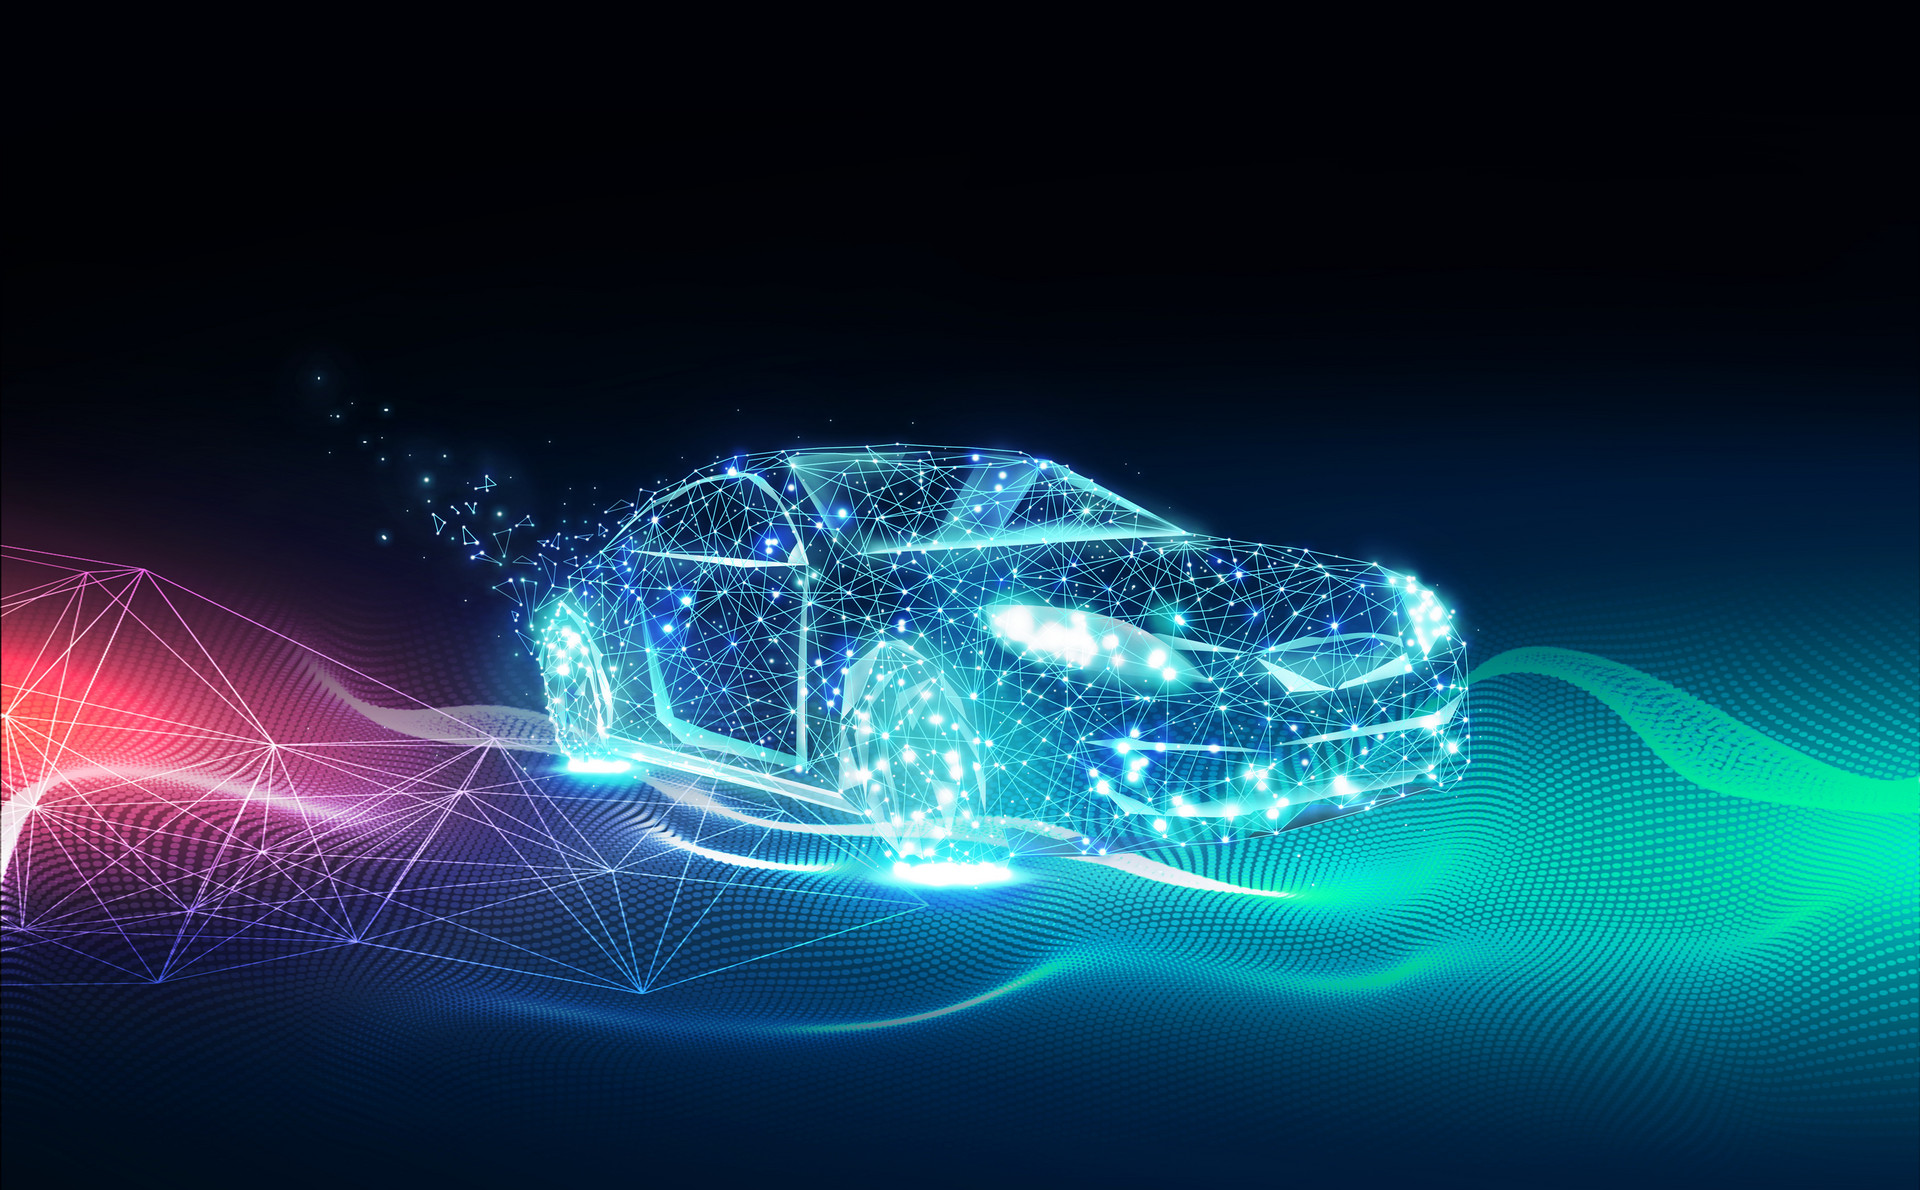 Maxim�l布�I界首款汽��安全�J�C器,有效增��汽�安全性